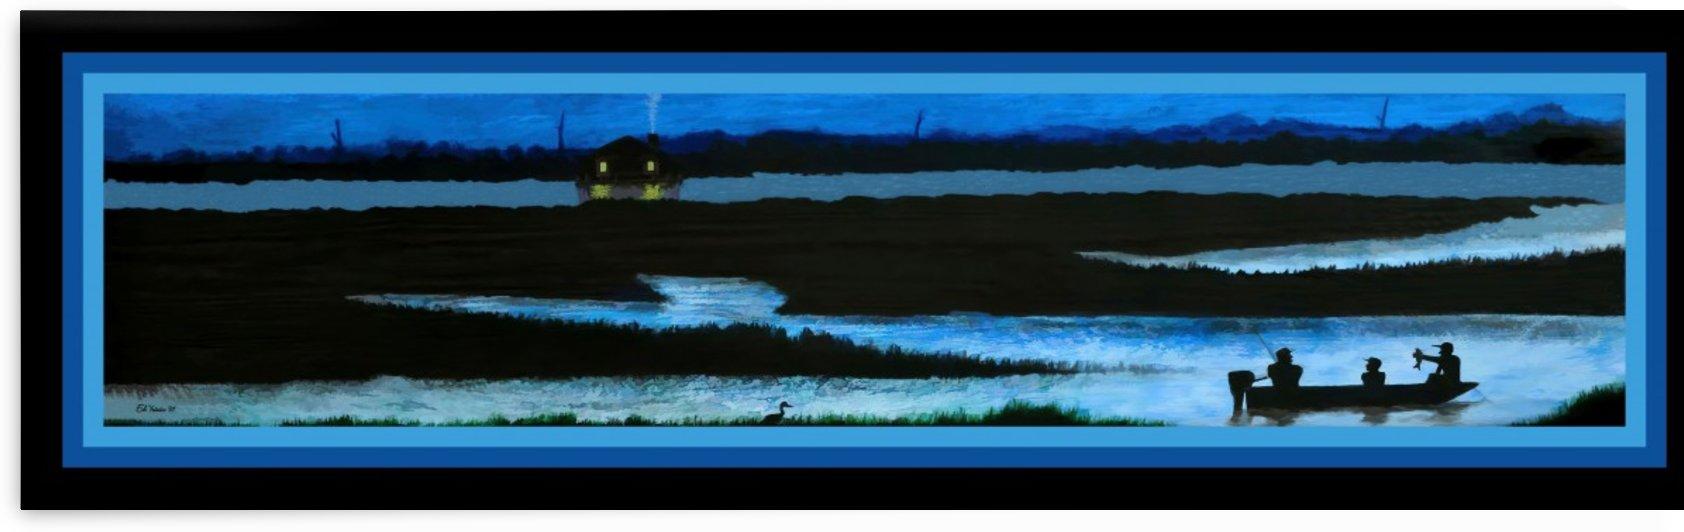 BLUE HOUR - FISHING by Digicam